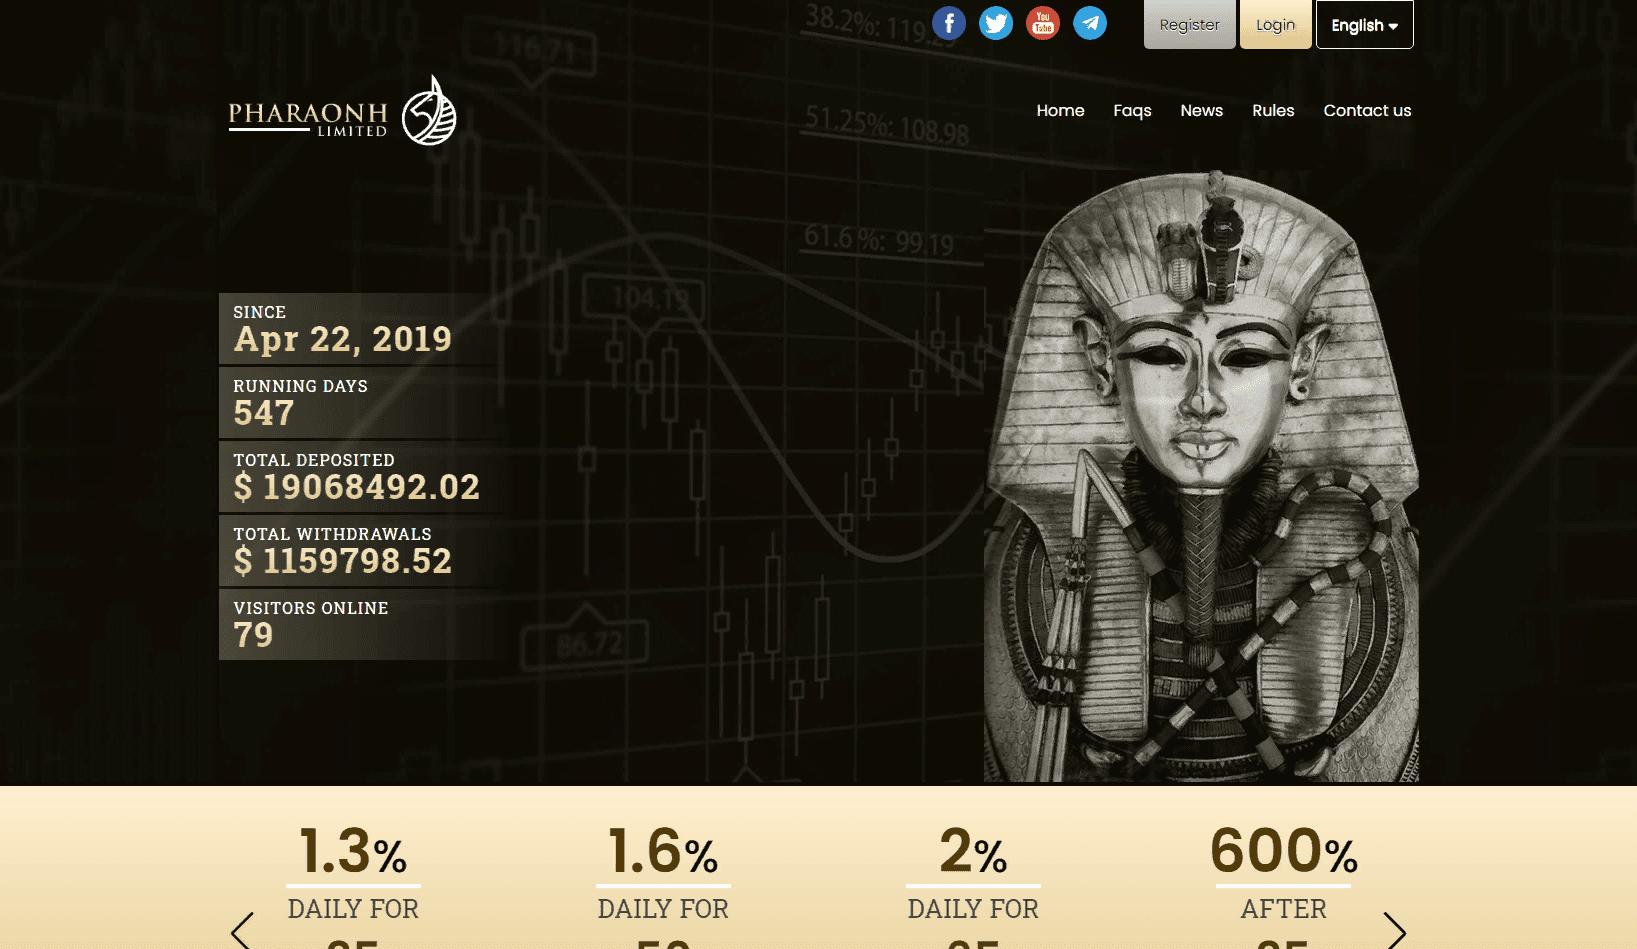 Pharaonh